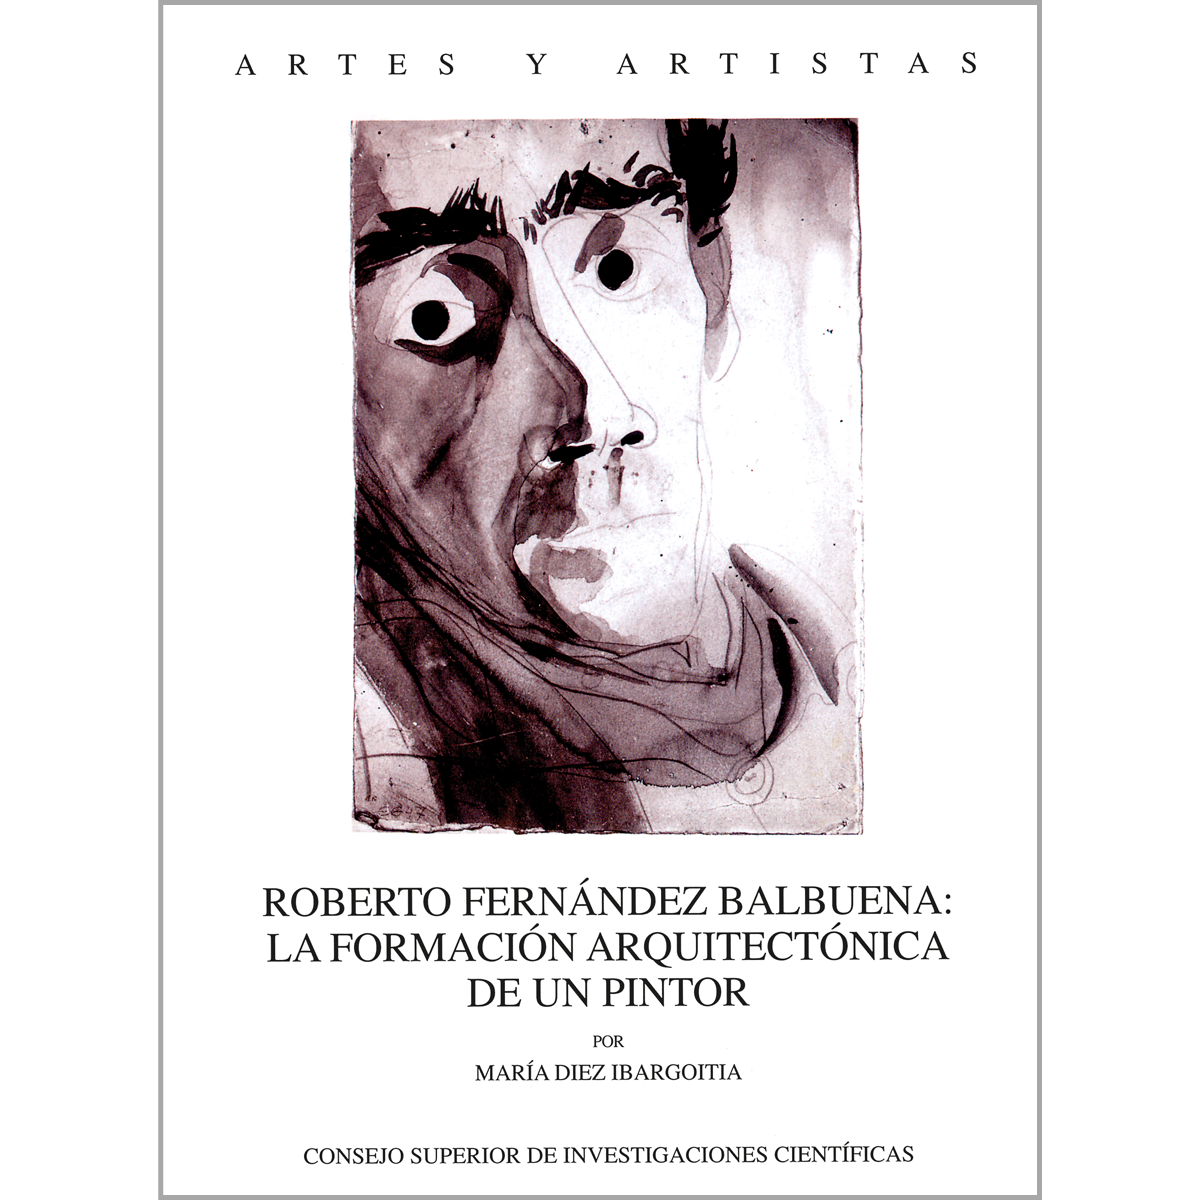 Roberto Fernández Balbuena: la formación arquitectónica de un pintor